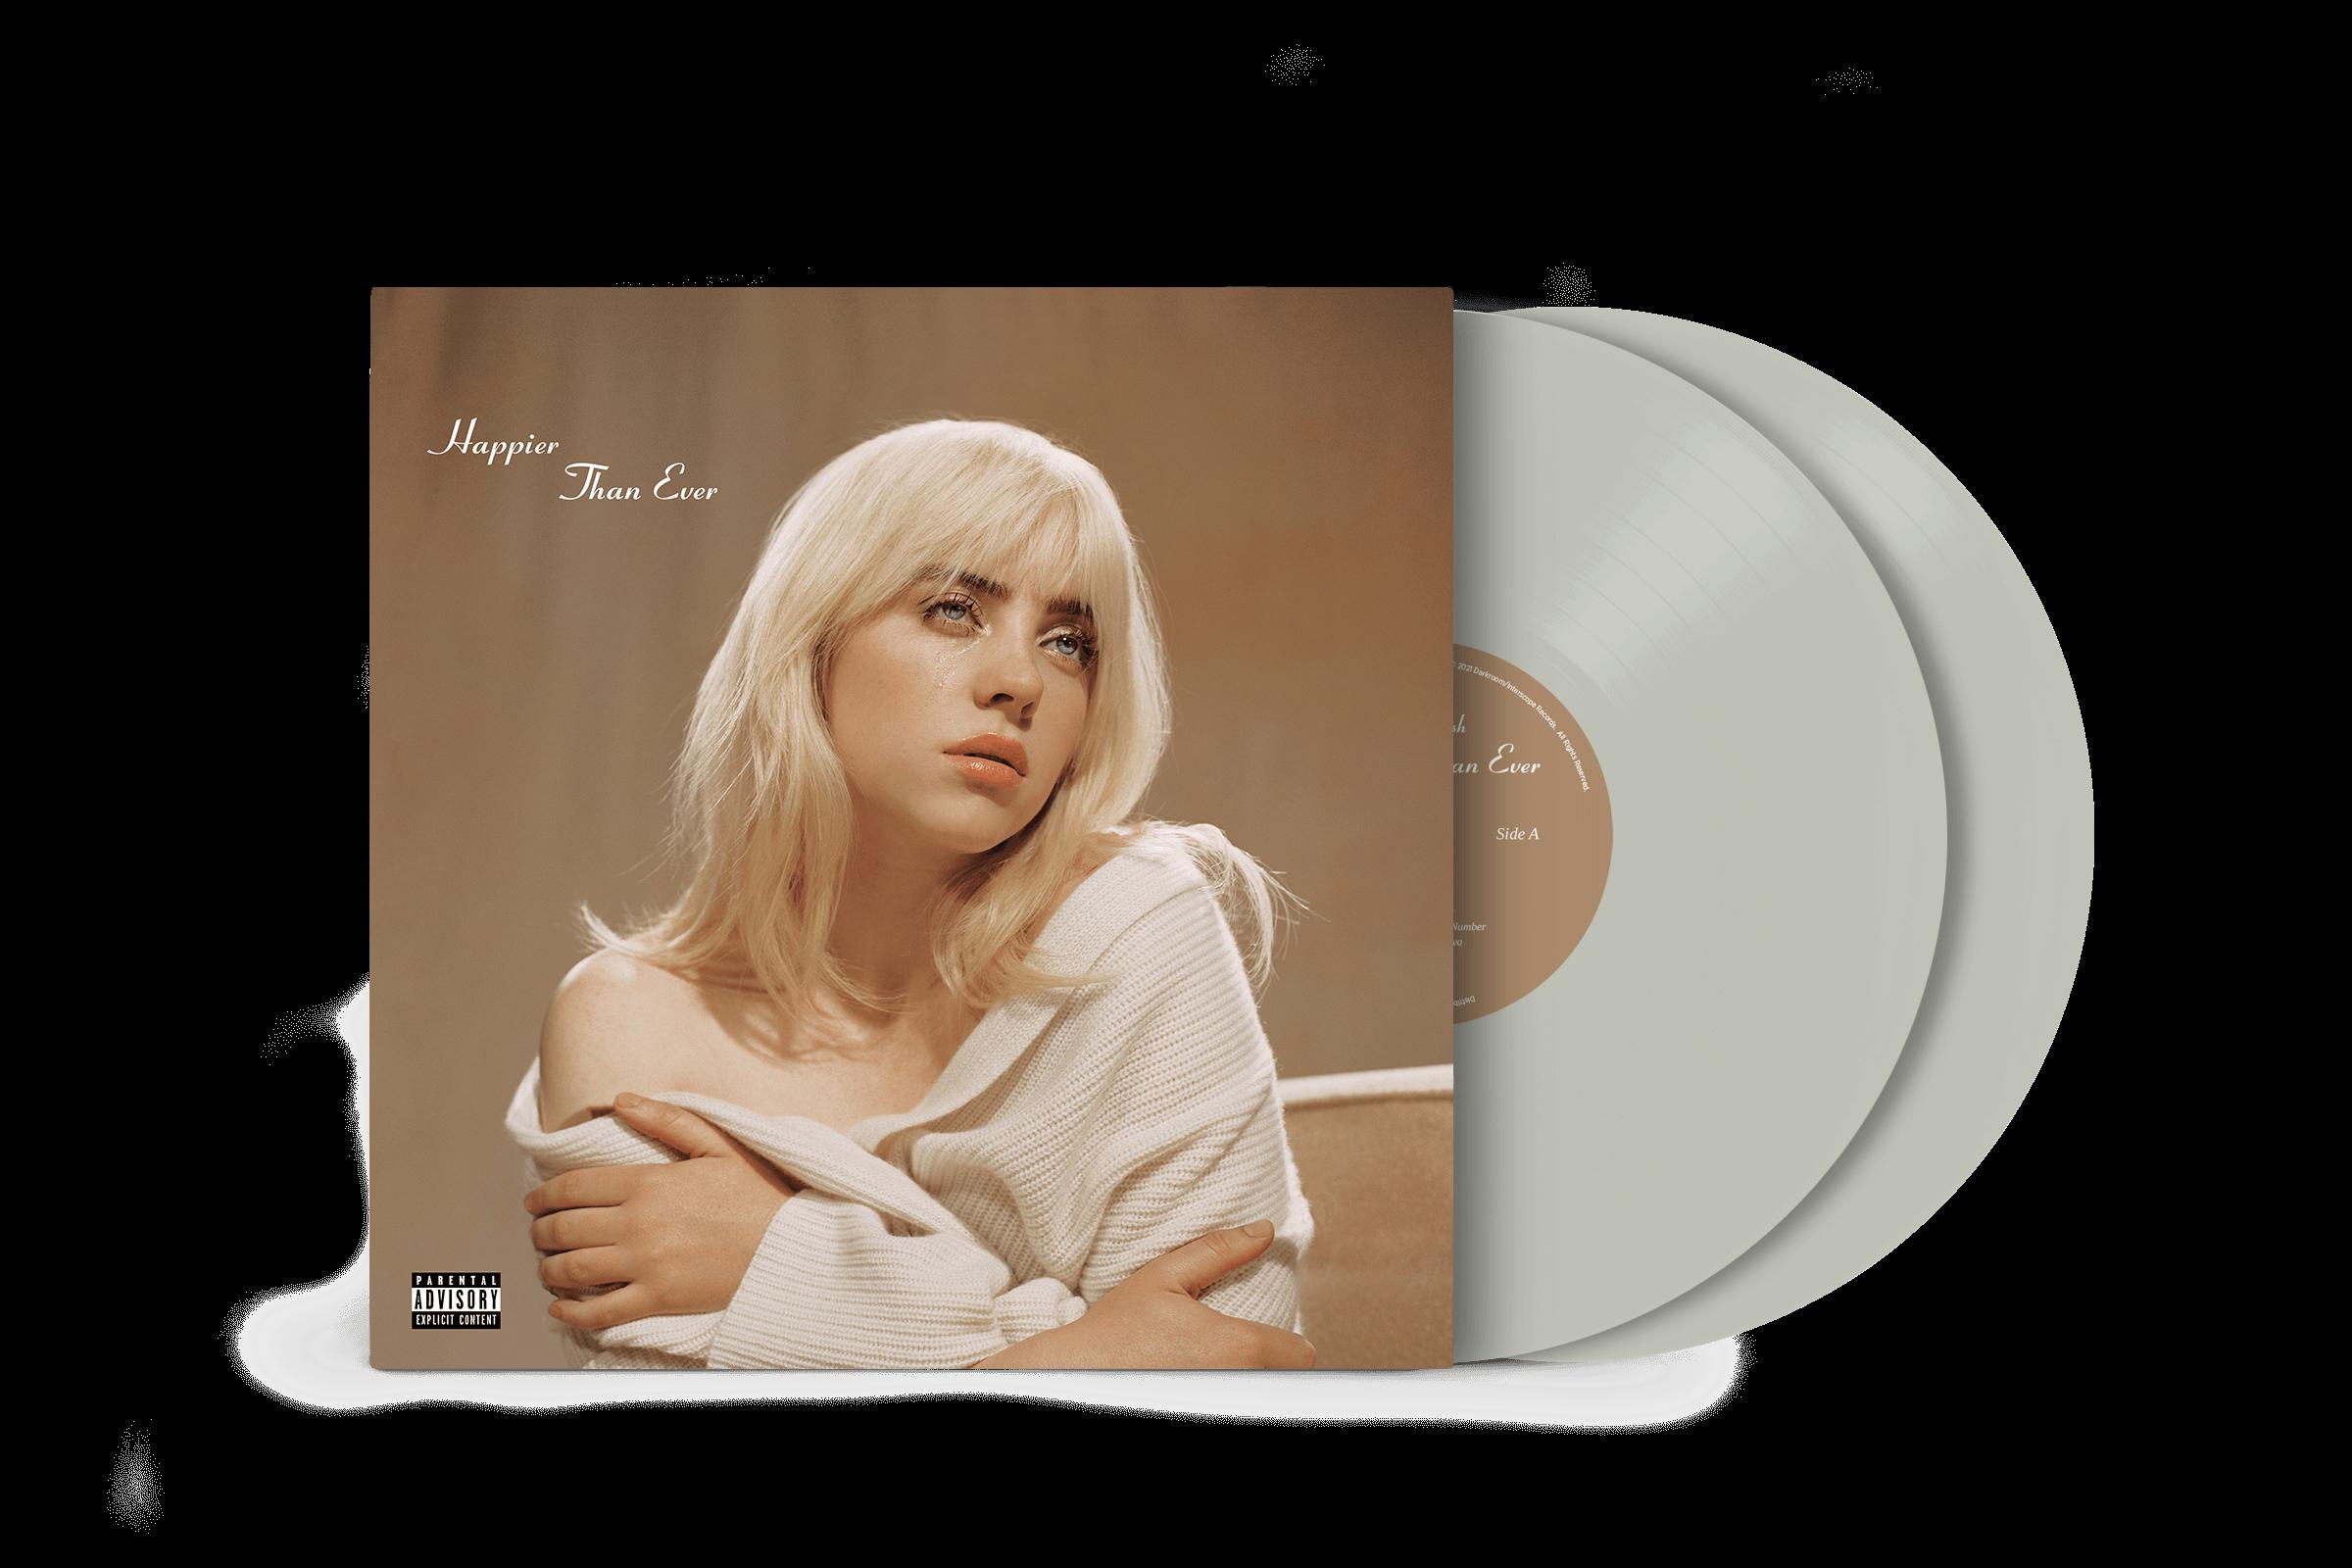 Official Billie Eilish Store - 'Happier Than Ever' Exclusive Cool Grey Vinyl  - Billie Eilish - 2LP